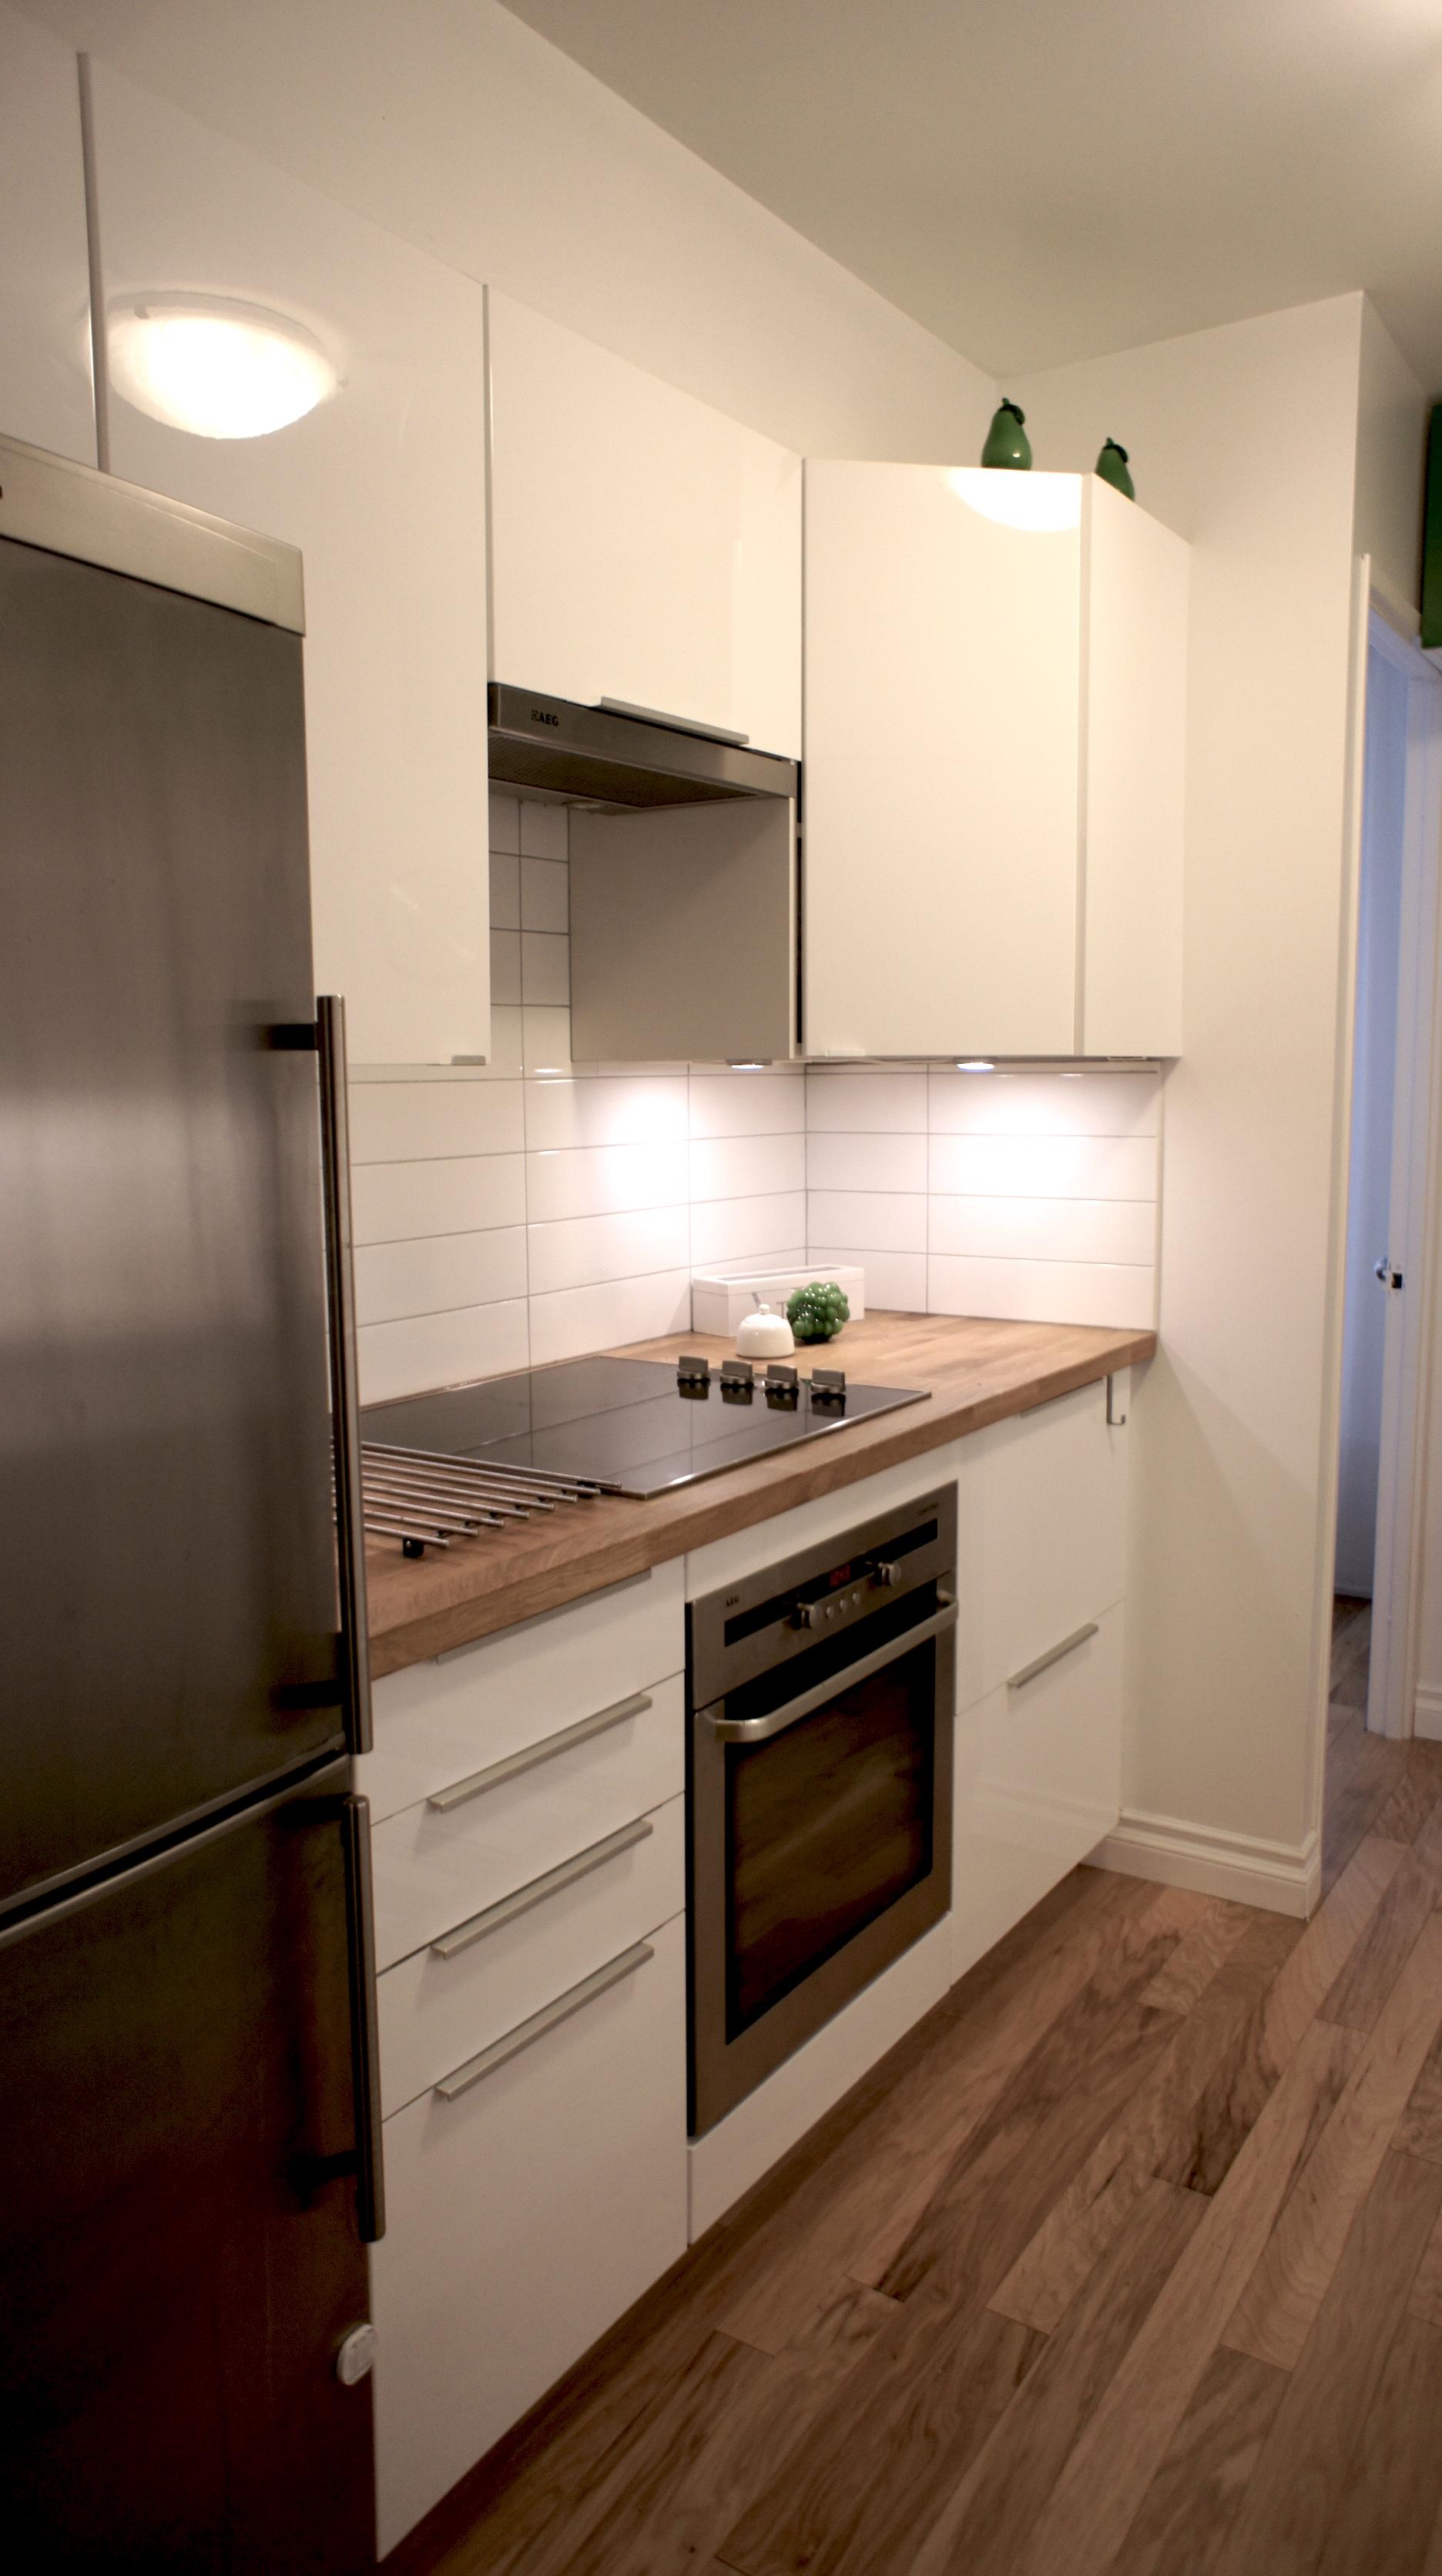 condo kitchen cooking area.jpg